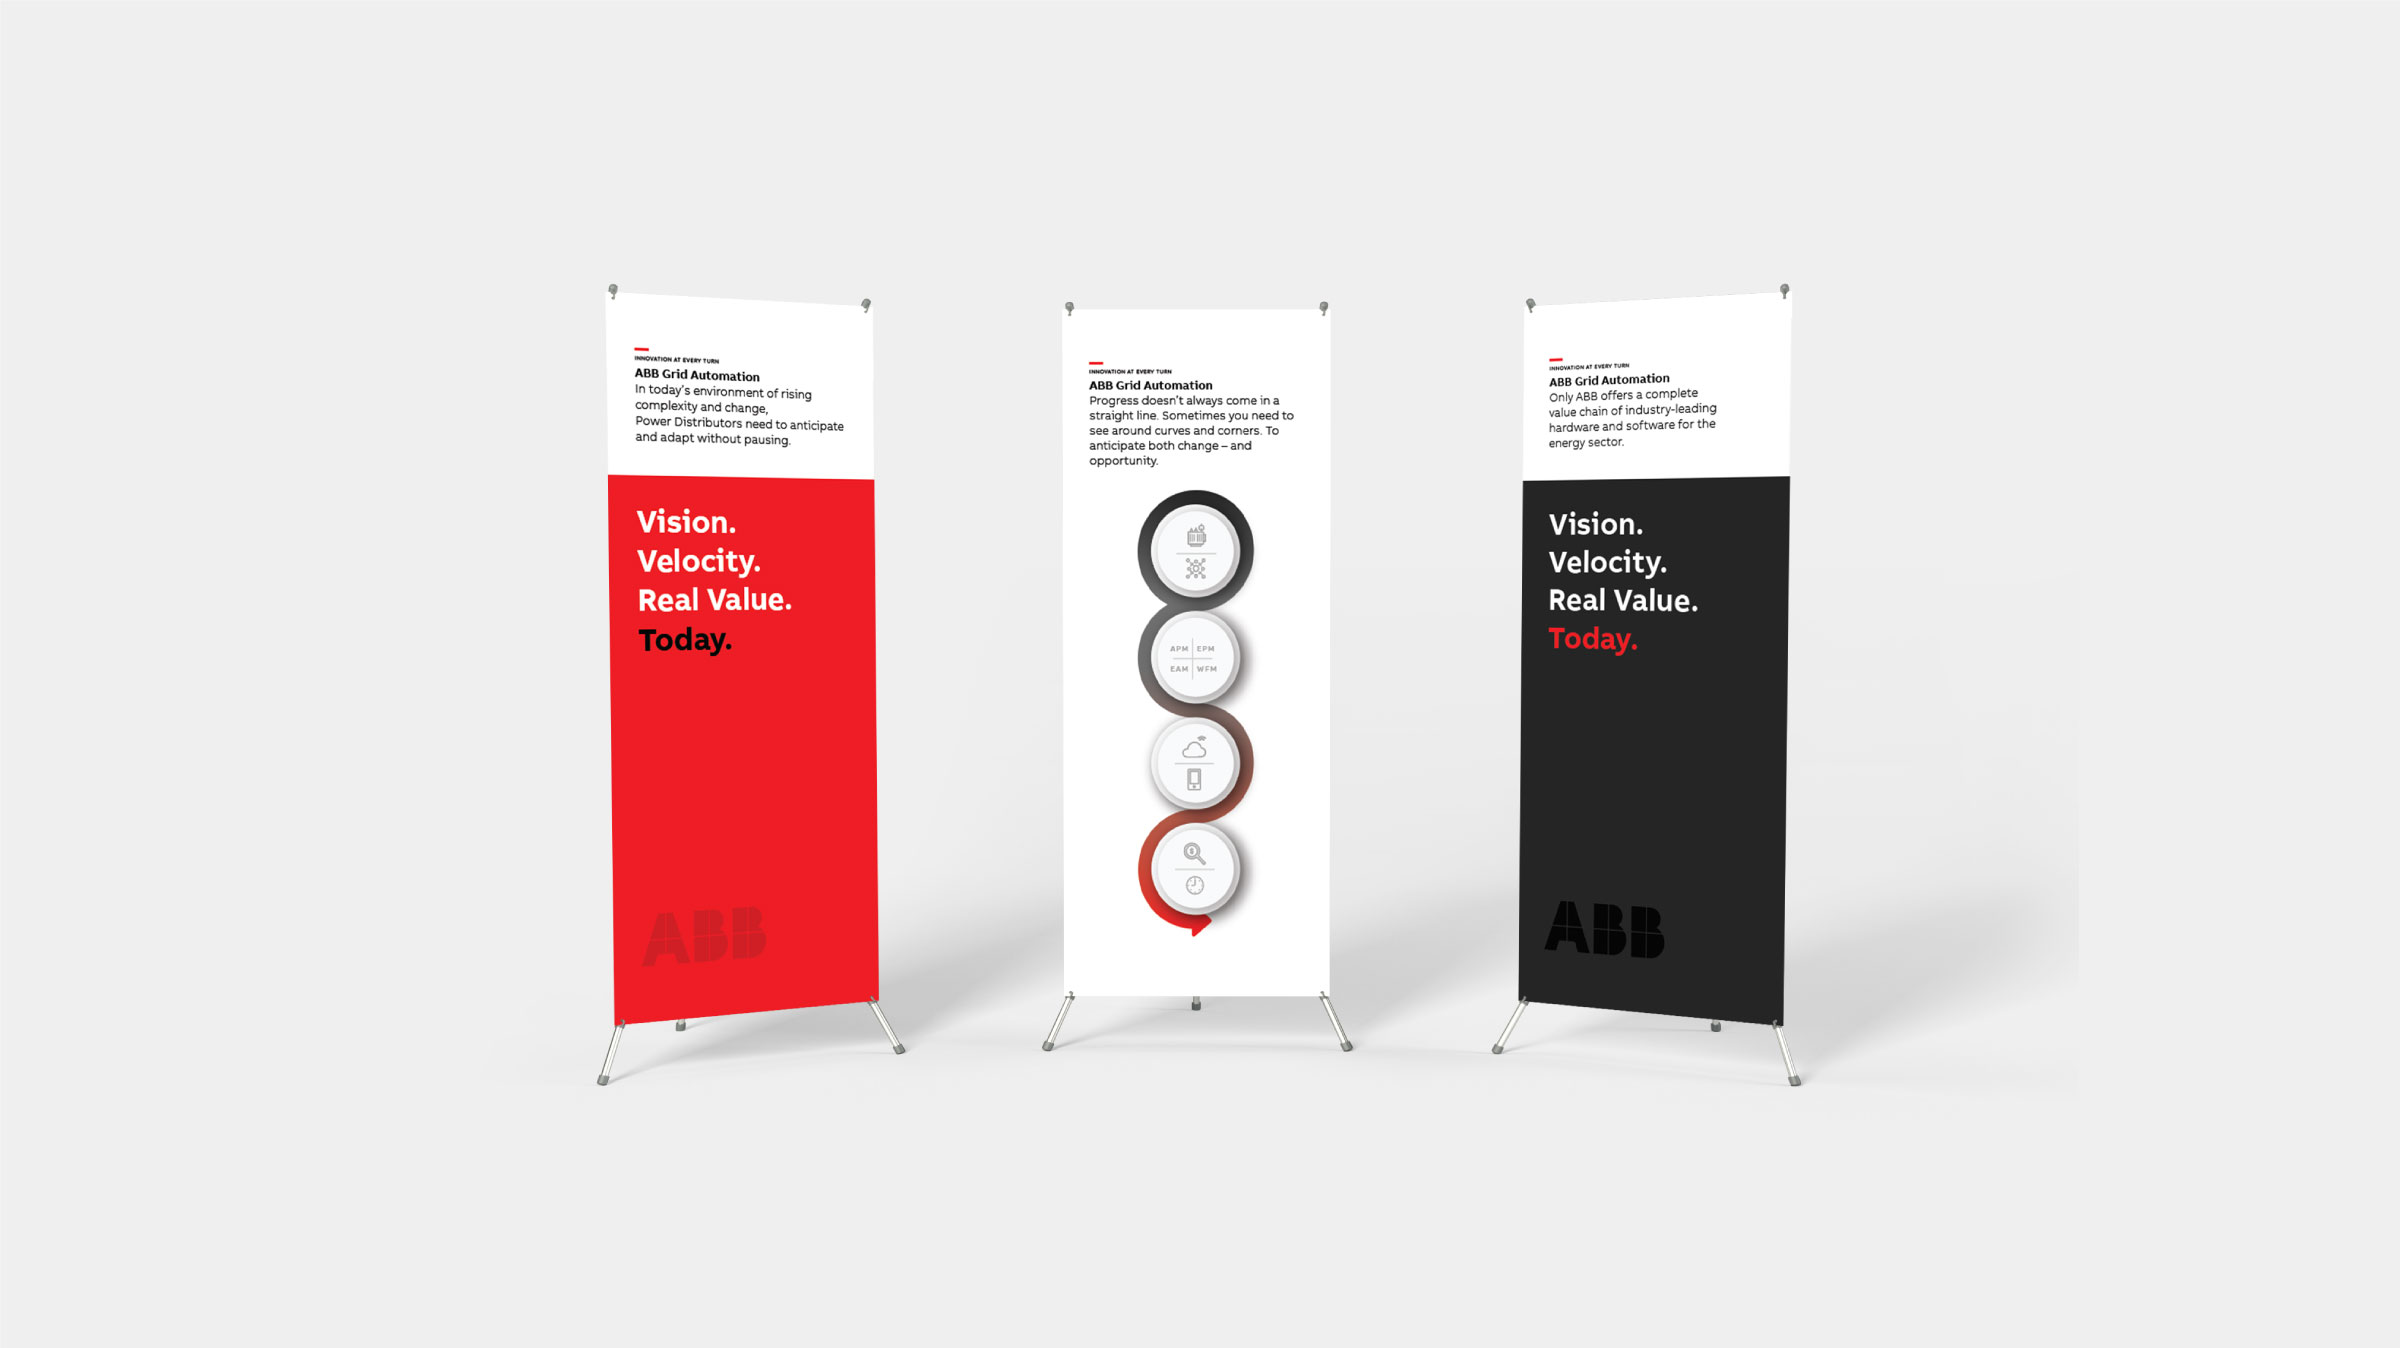 ABB-Booth